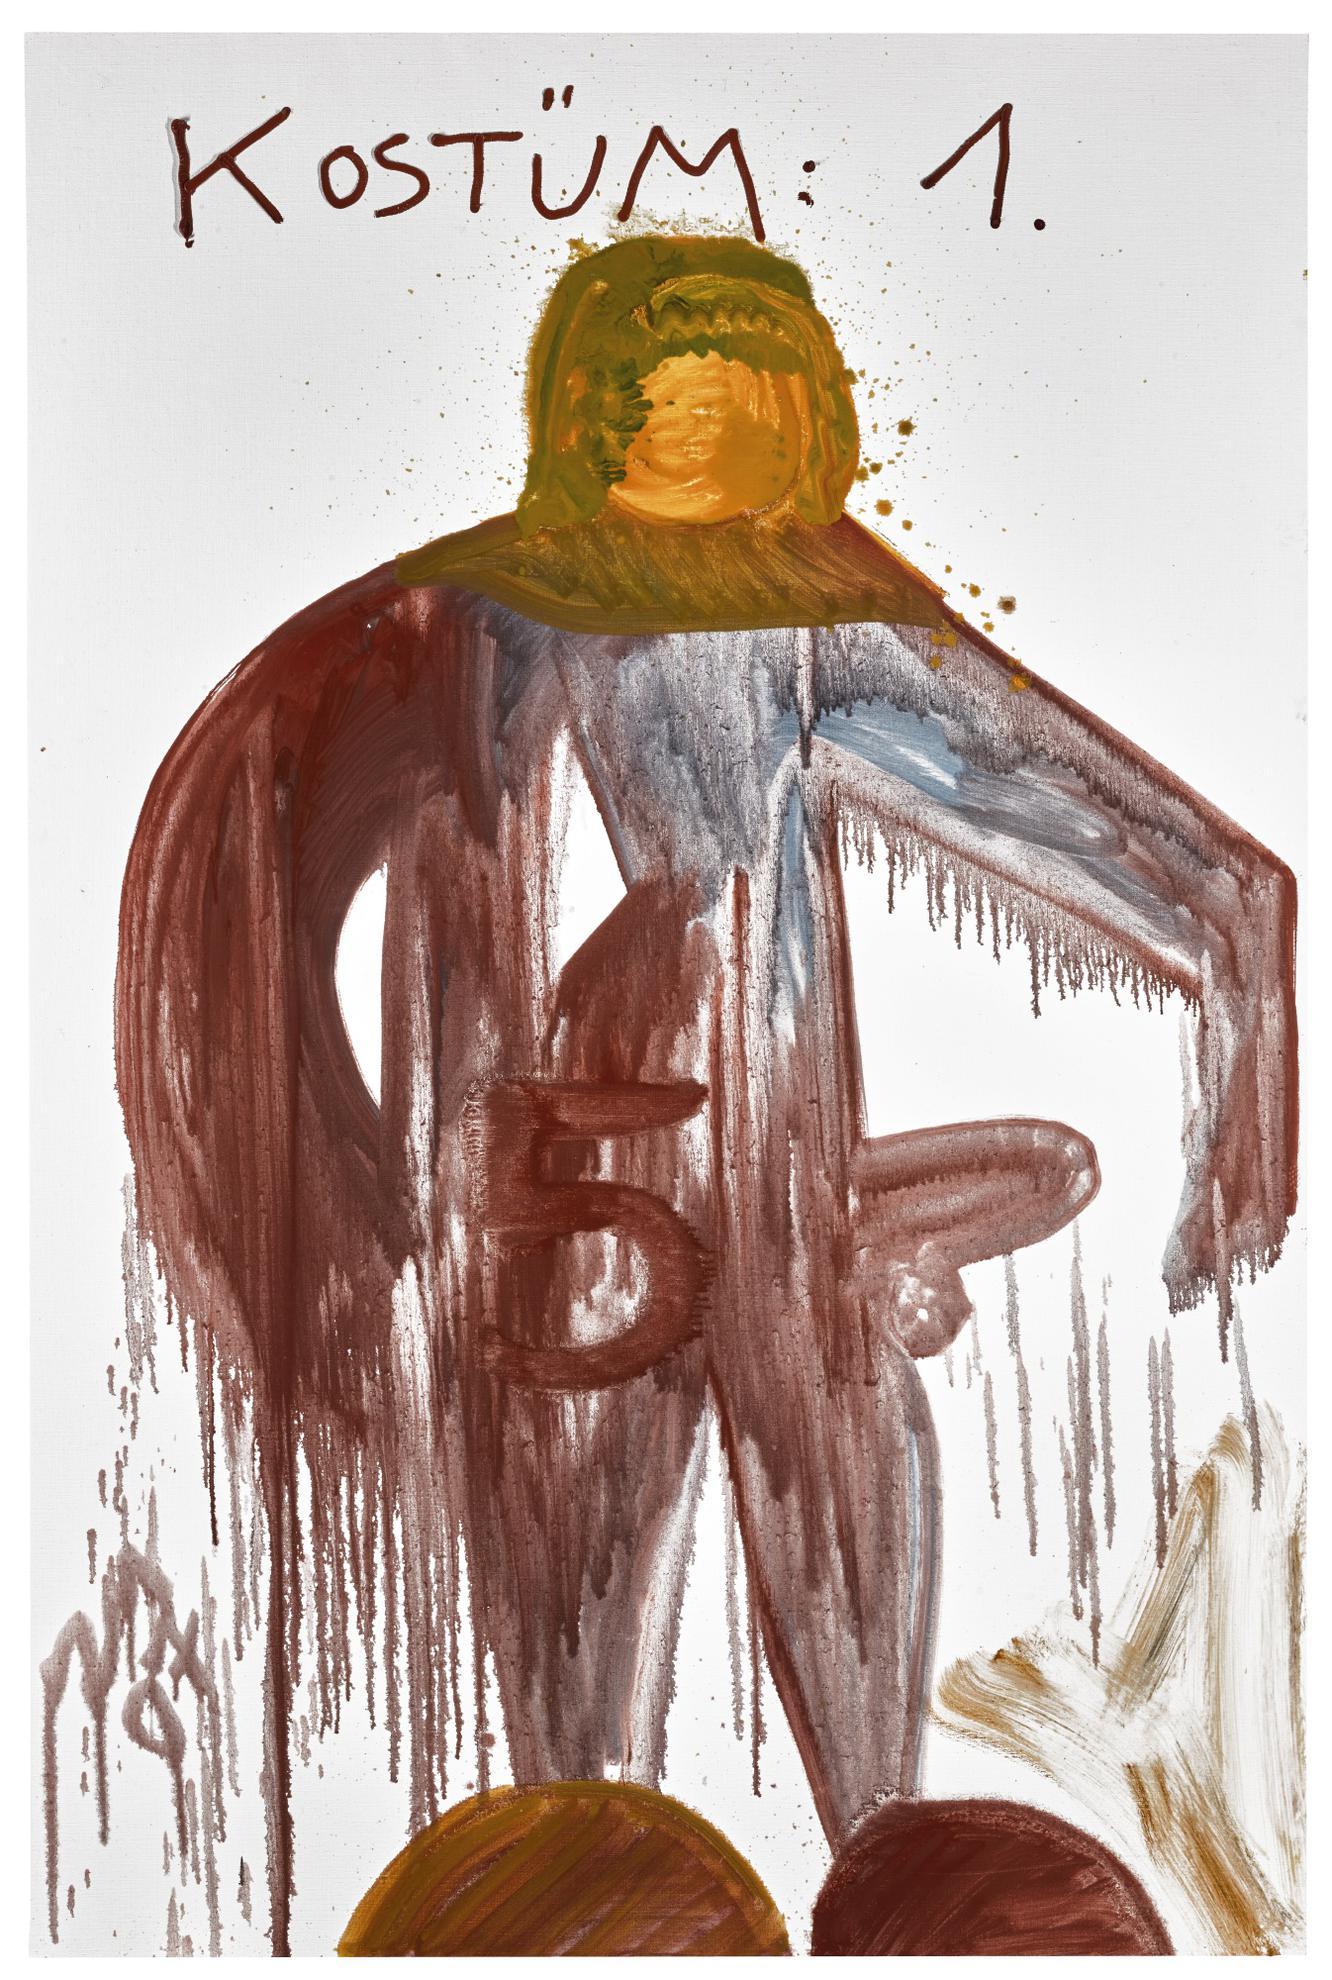 Jonathan Meese-Kostum Backenbart Vom Zacknbarschi Nopponnon-2007